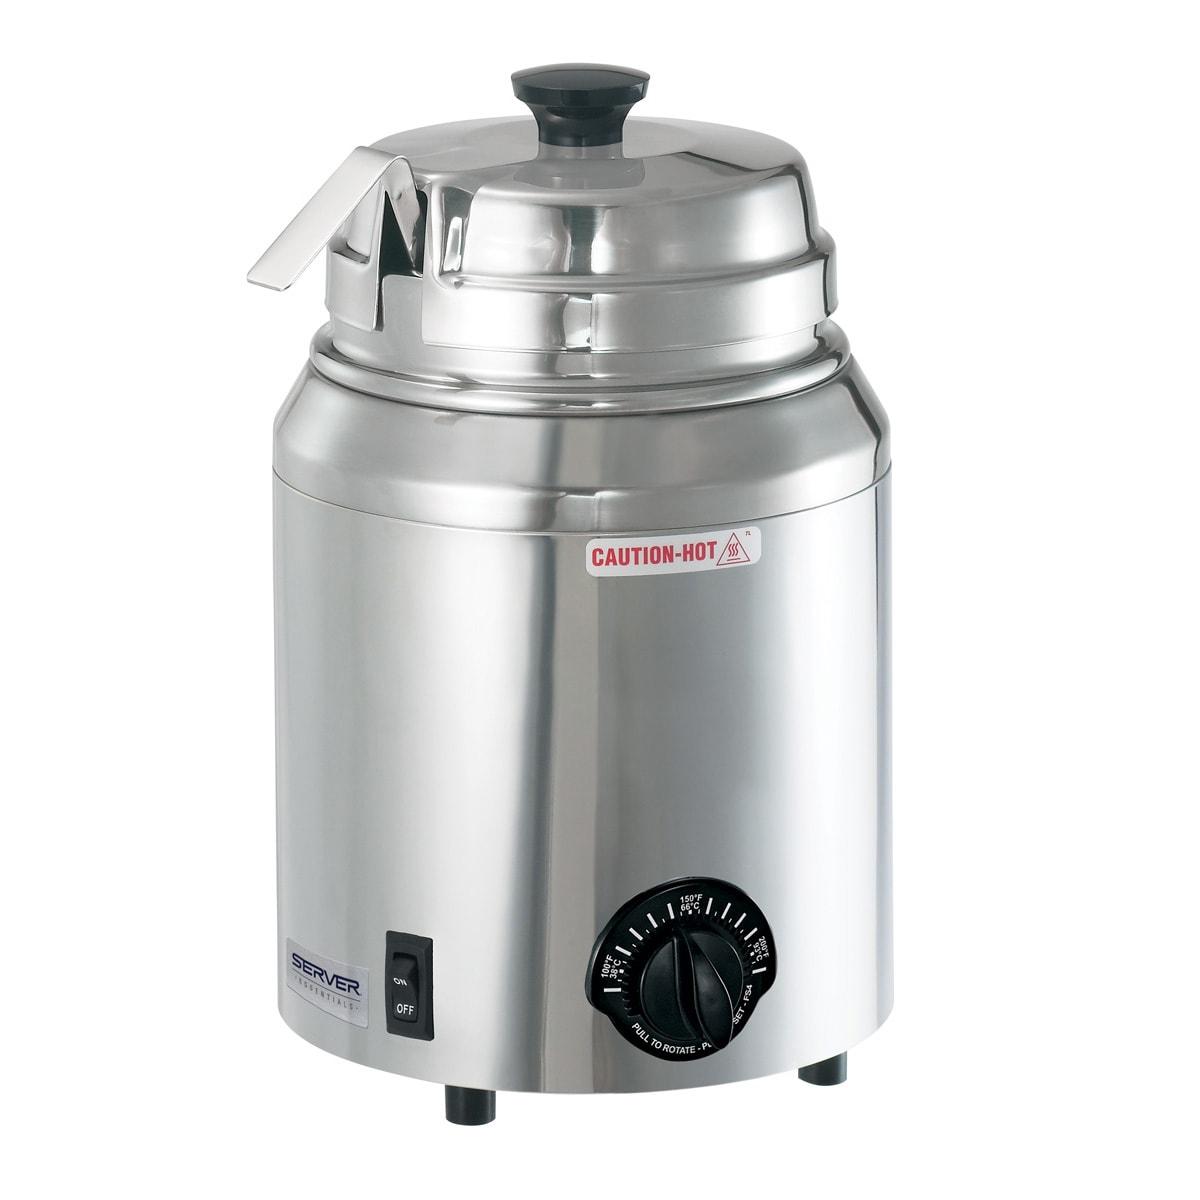 Server 82500 Food Server - Ladle, For Rethermalization, Stainless Steel Water Bath Warmer